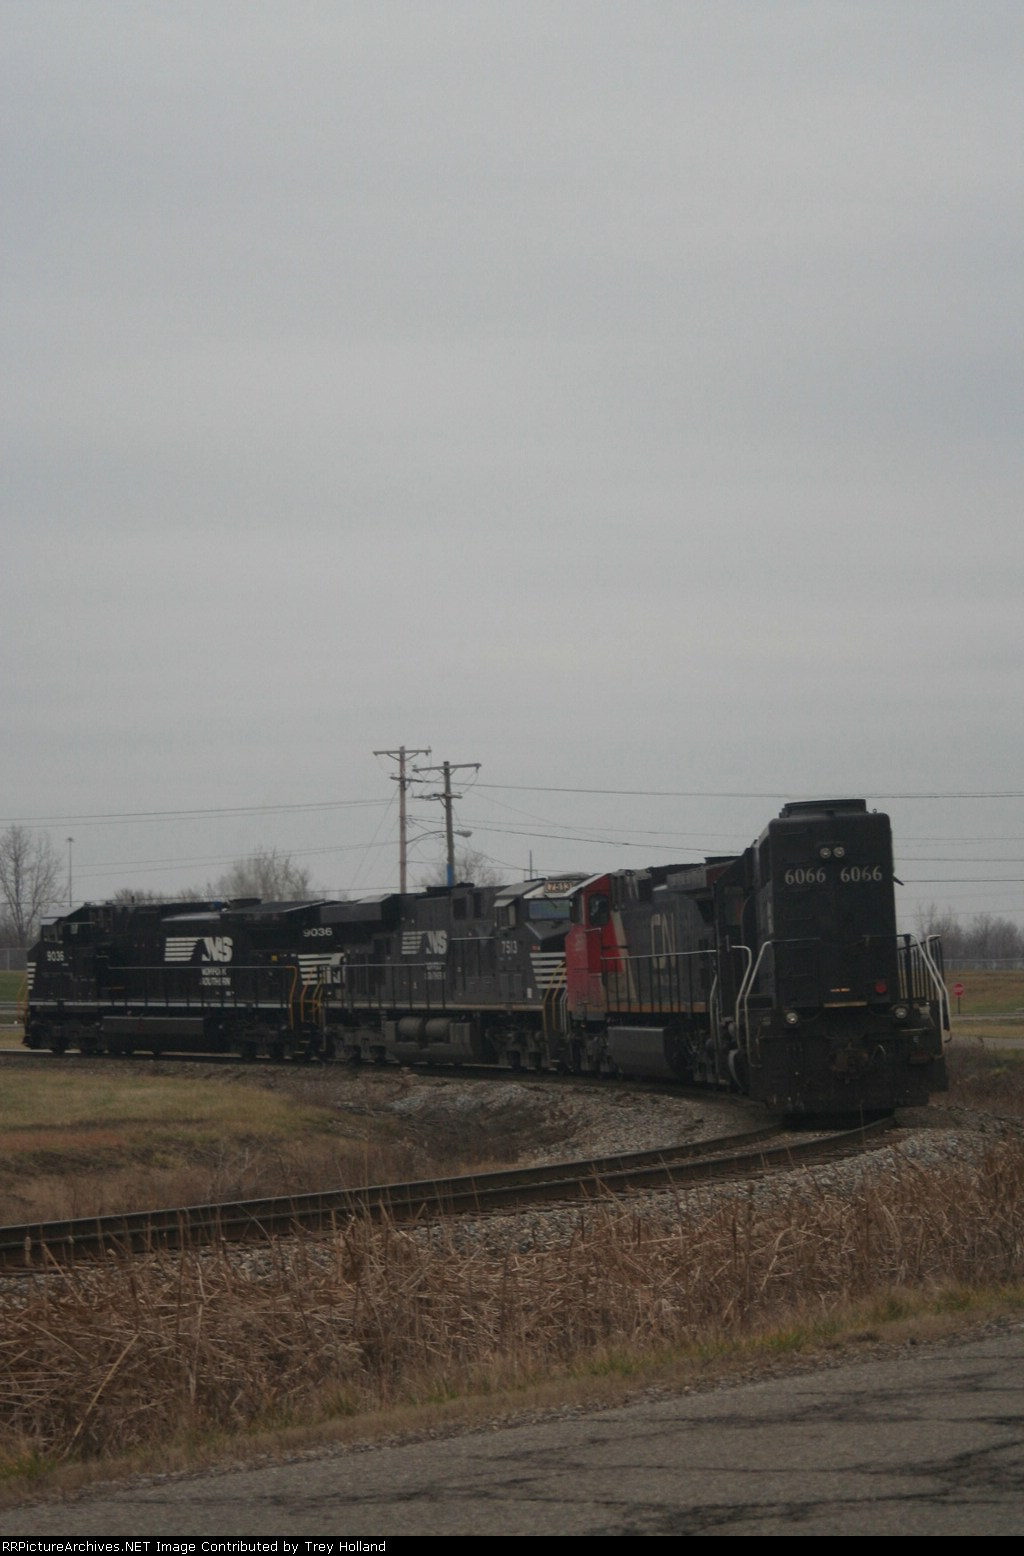 IC 6066